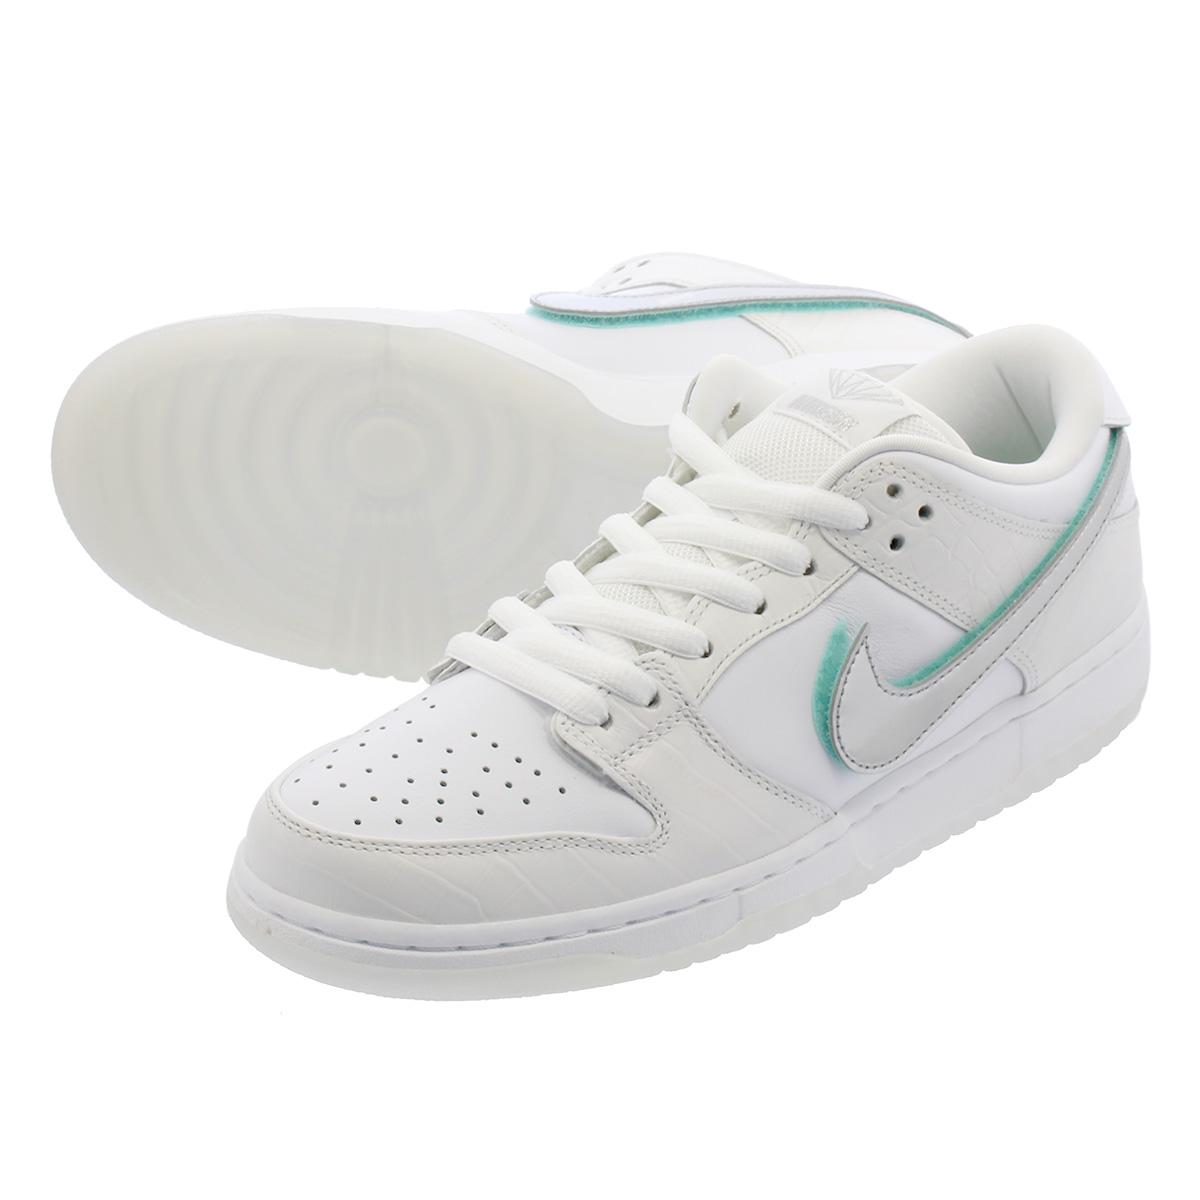 best service e3102 7a4d2 NIKE SB DUNK LOW PRO OG QS Nike SB dunk low pro Aussie QS  WHITE CHROME WHITE TROPICAL TWIST bv1310-100